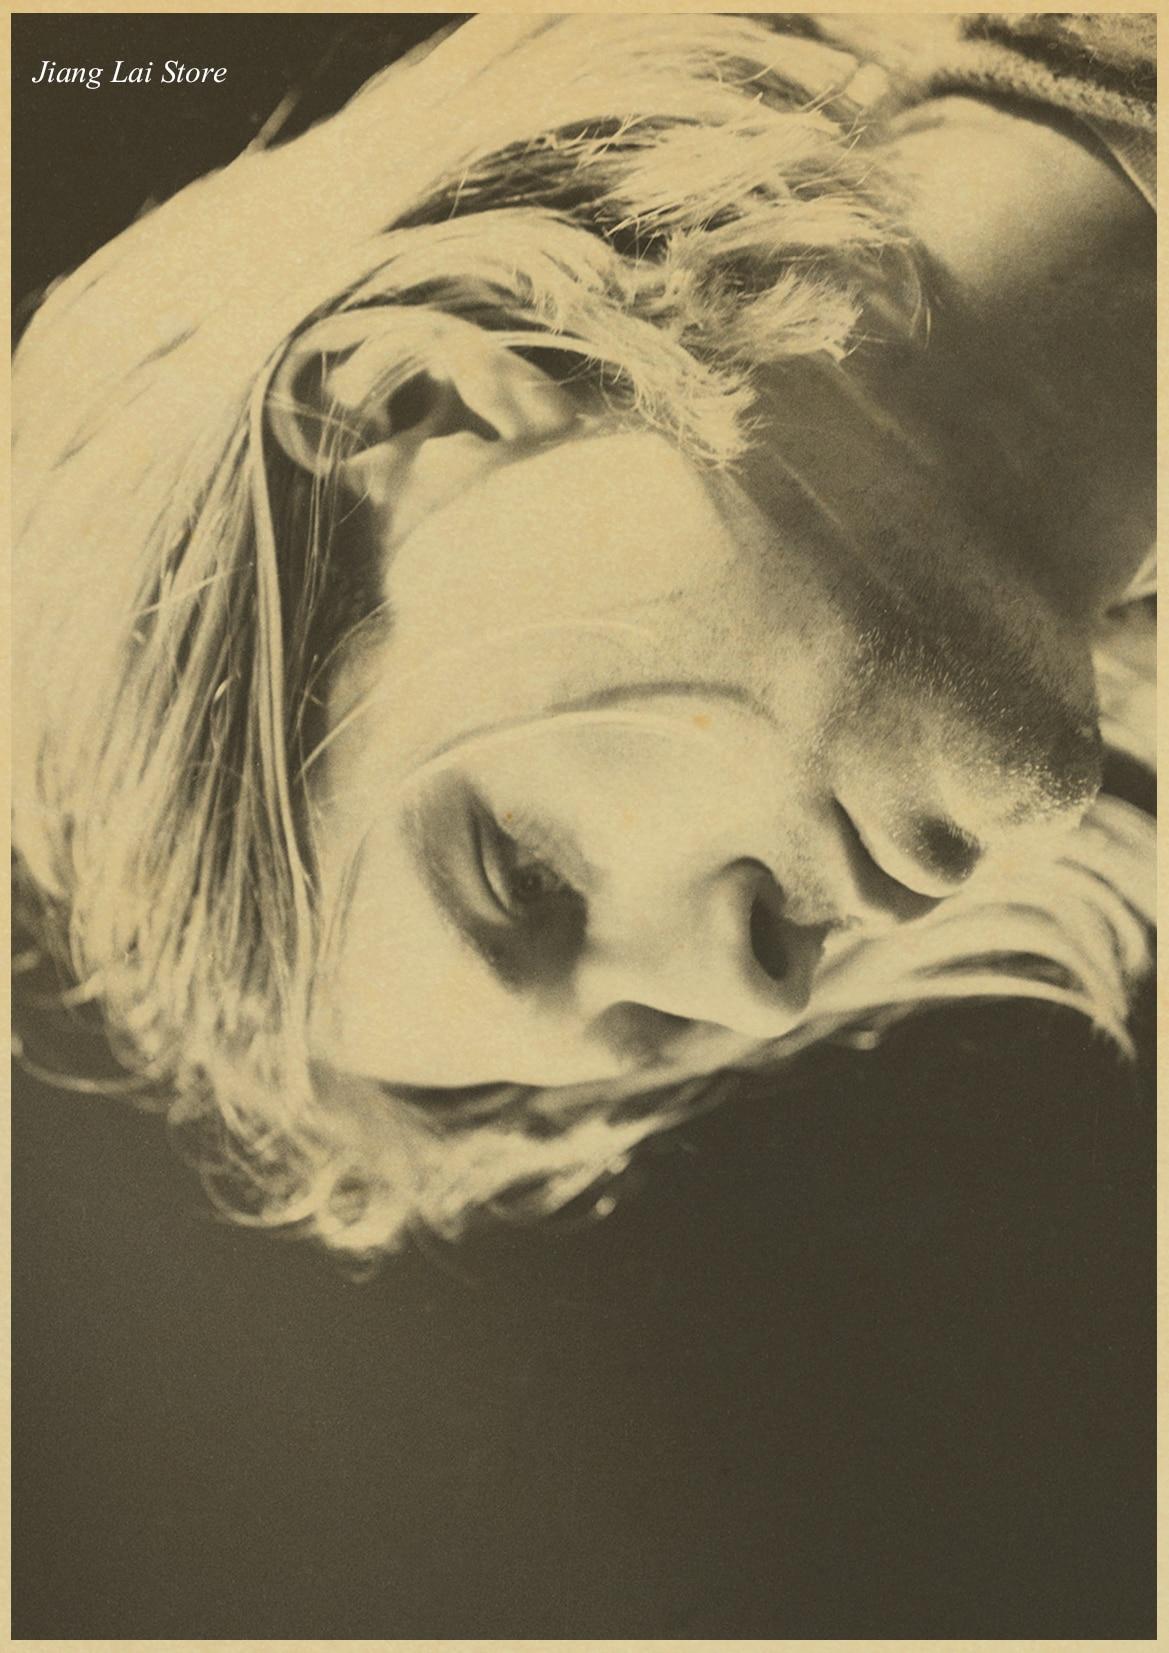 Nirvana Kurt Cobain Rock band Poster Home Furnishing decoration ...